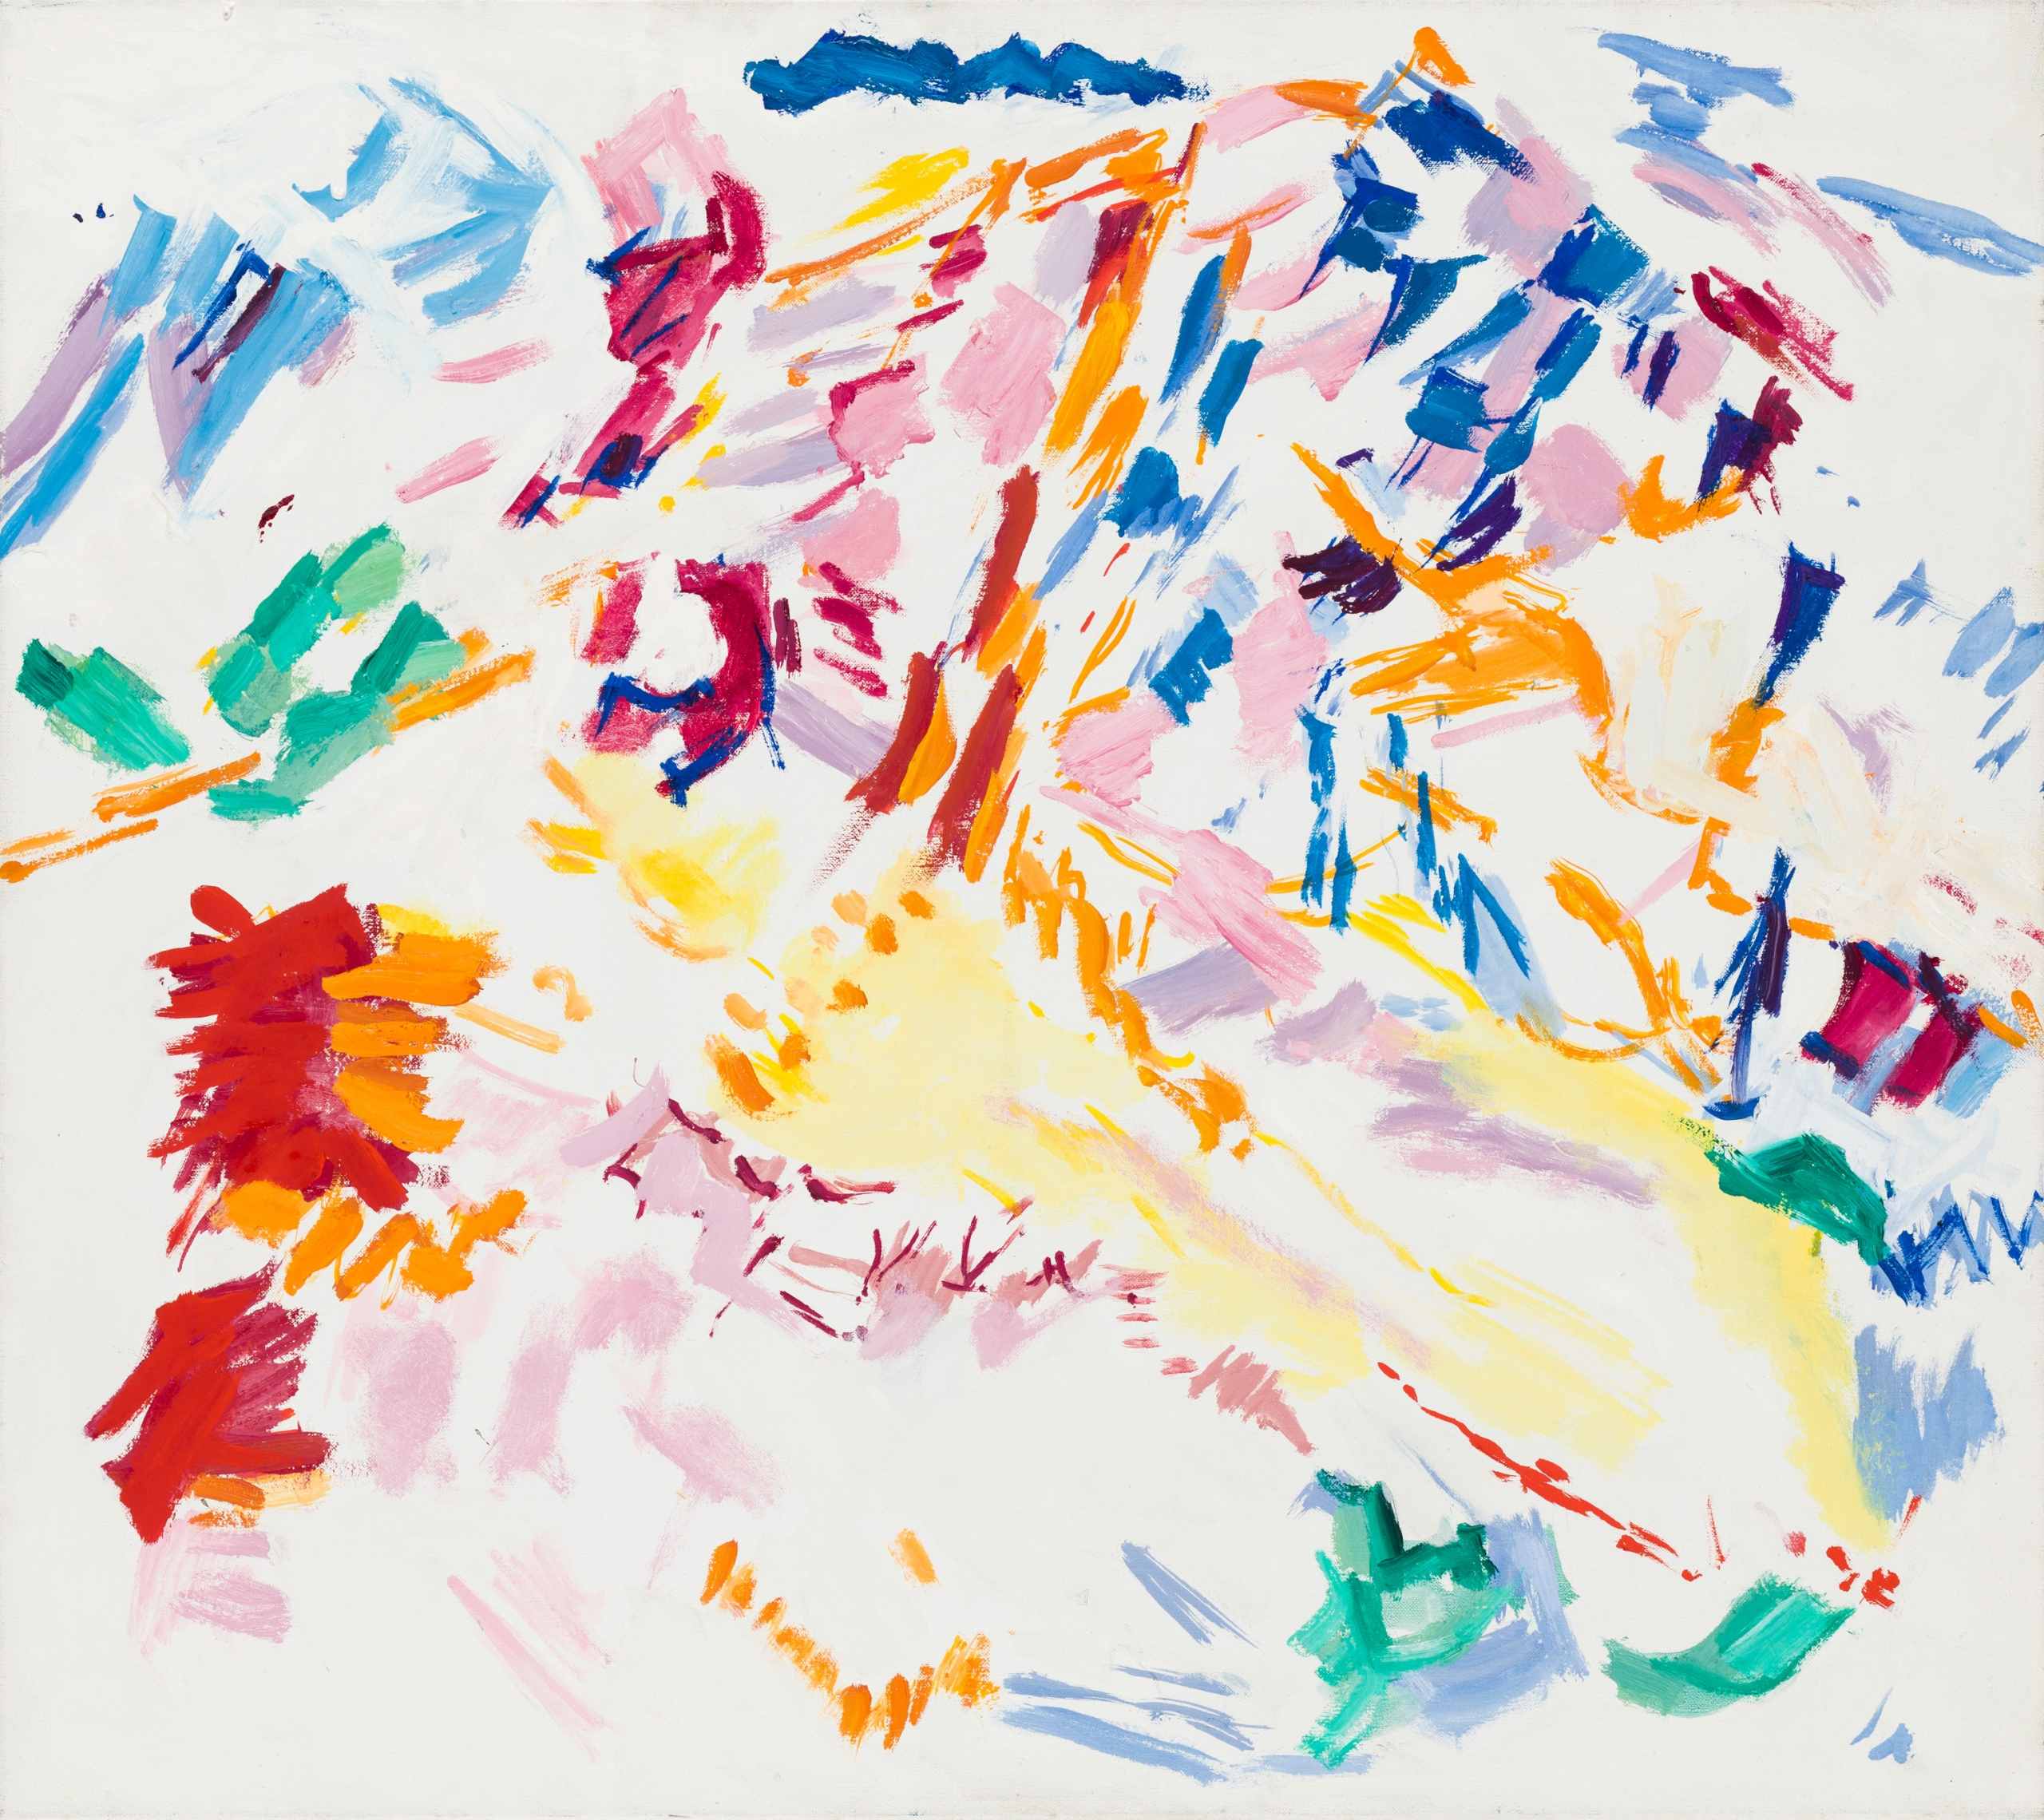 Carl Unger, Felswand II